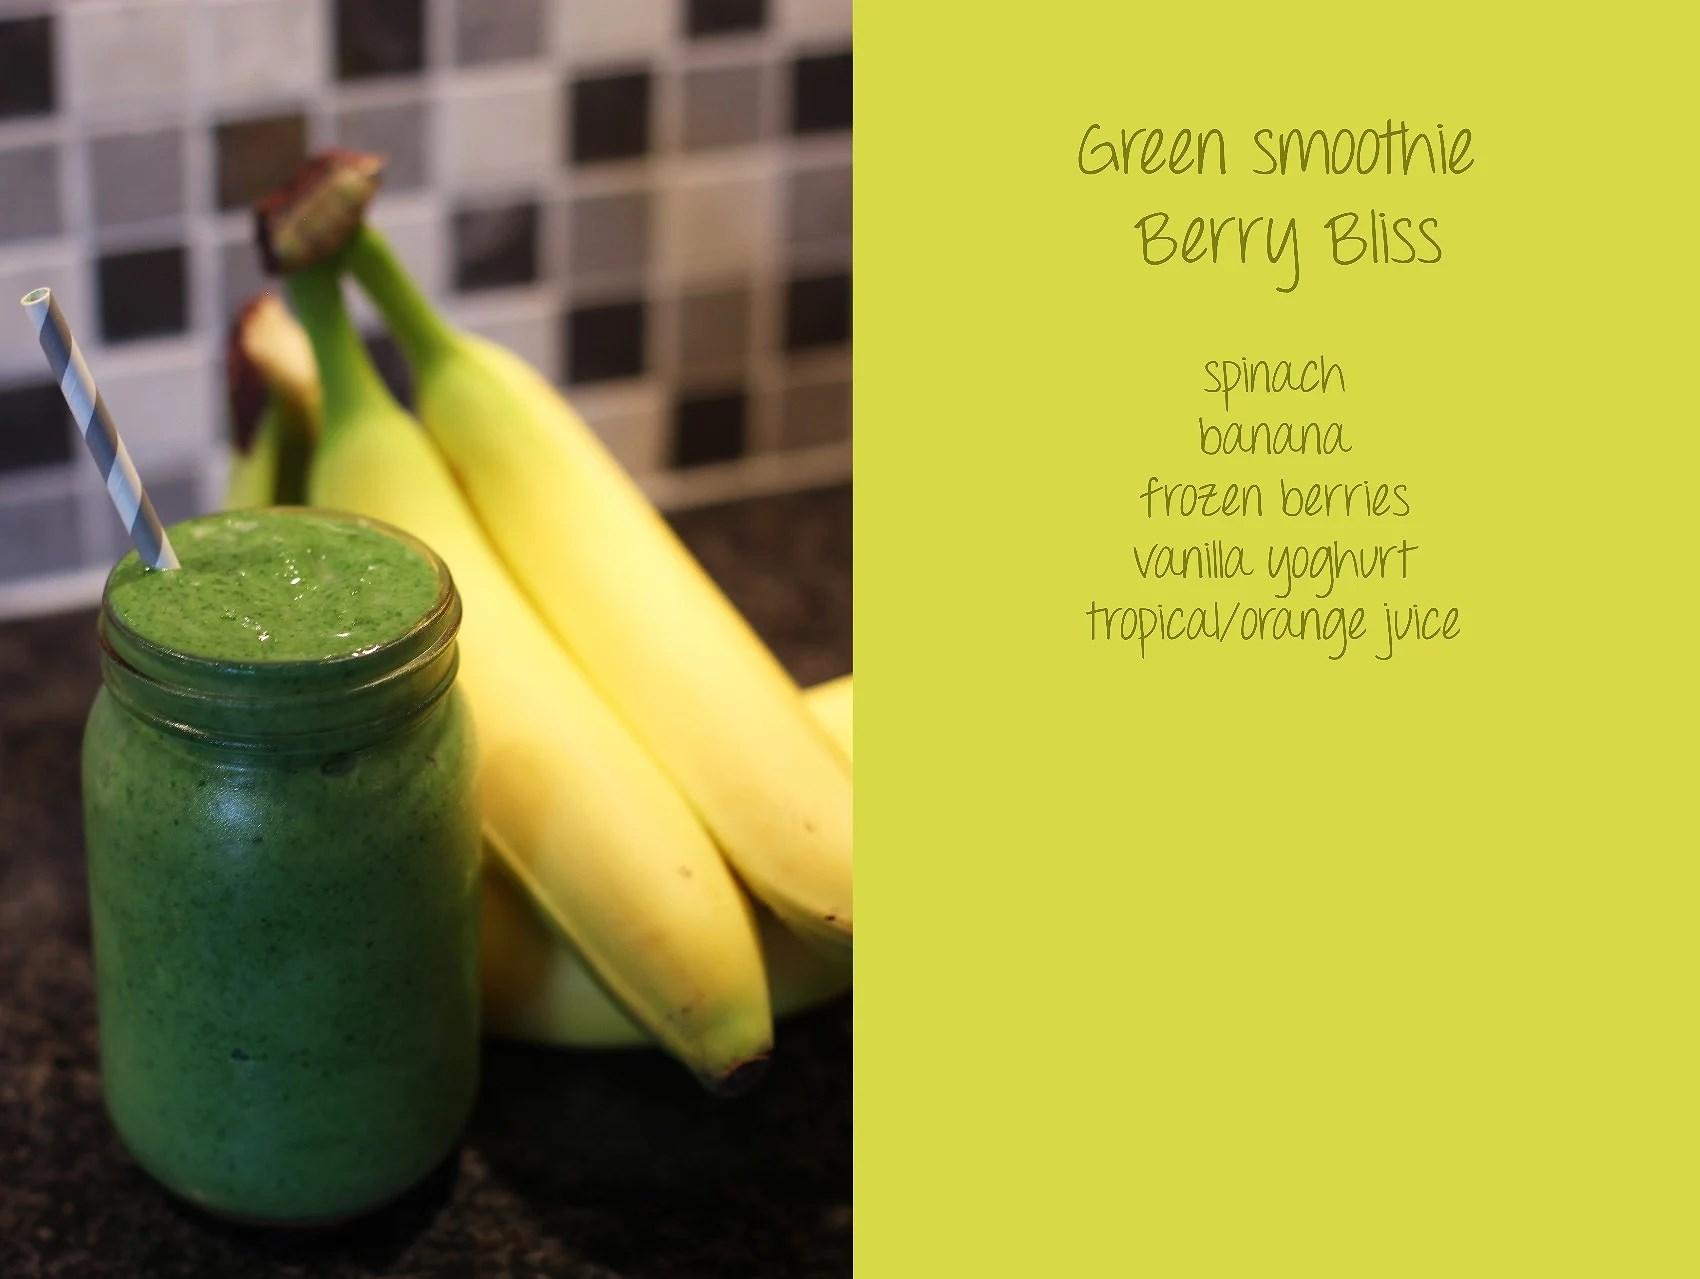 Recept på grön smoothie